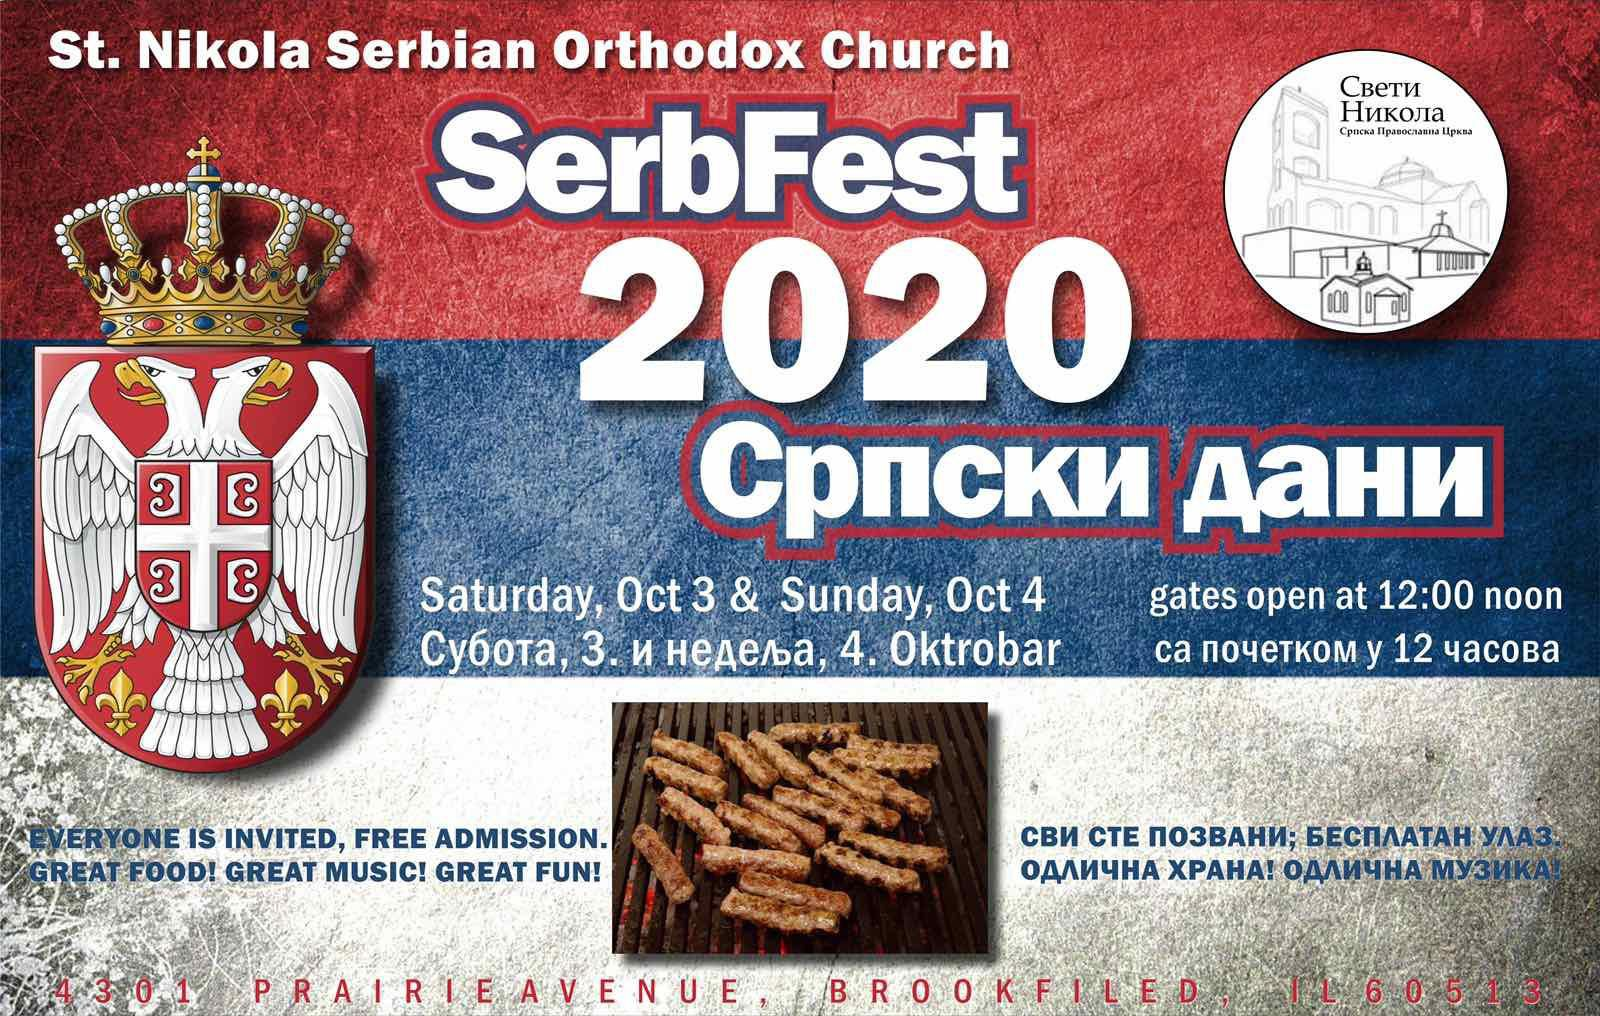 Ne propustite – Serb Fest 2020